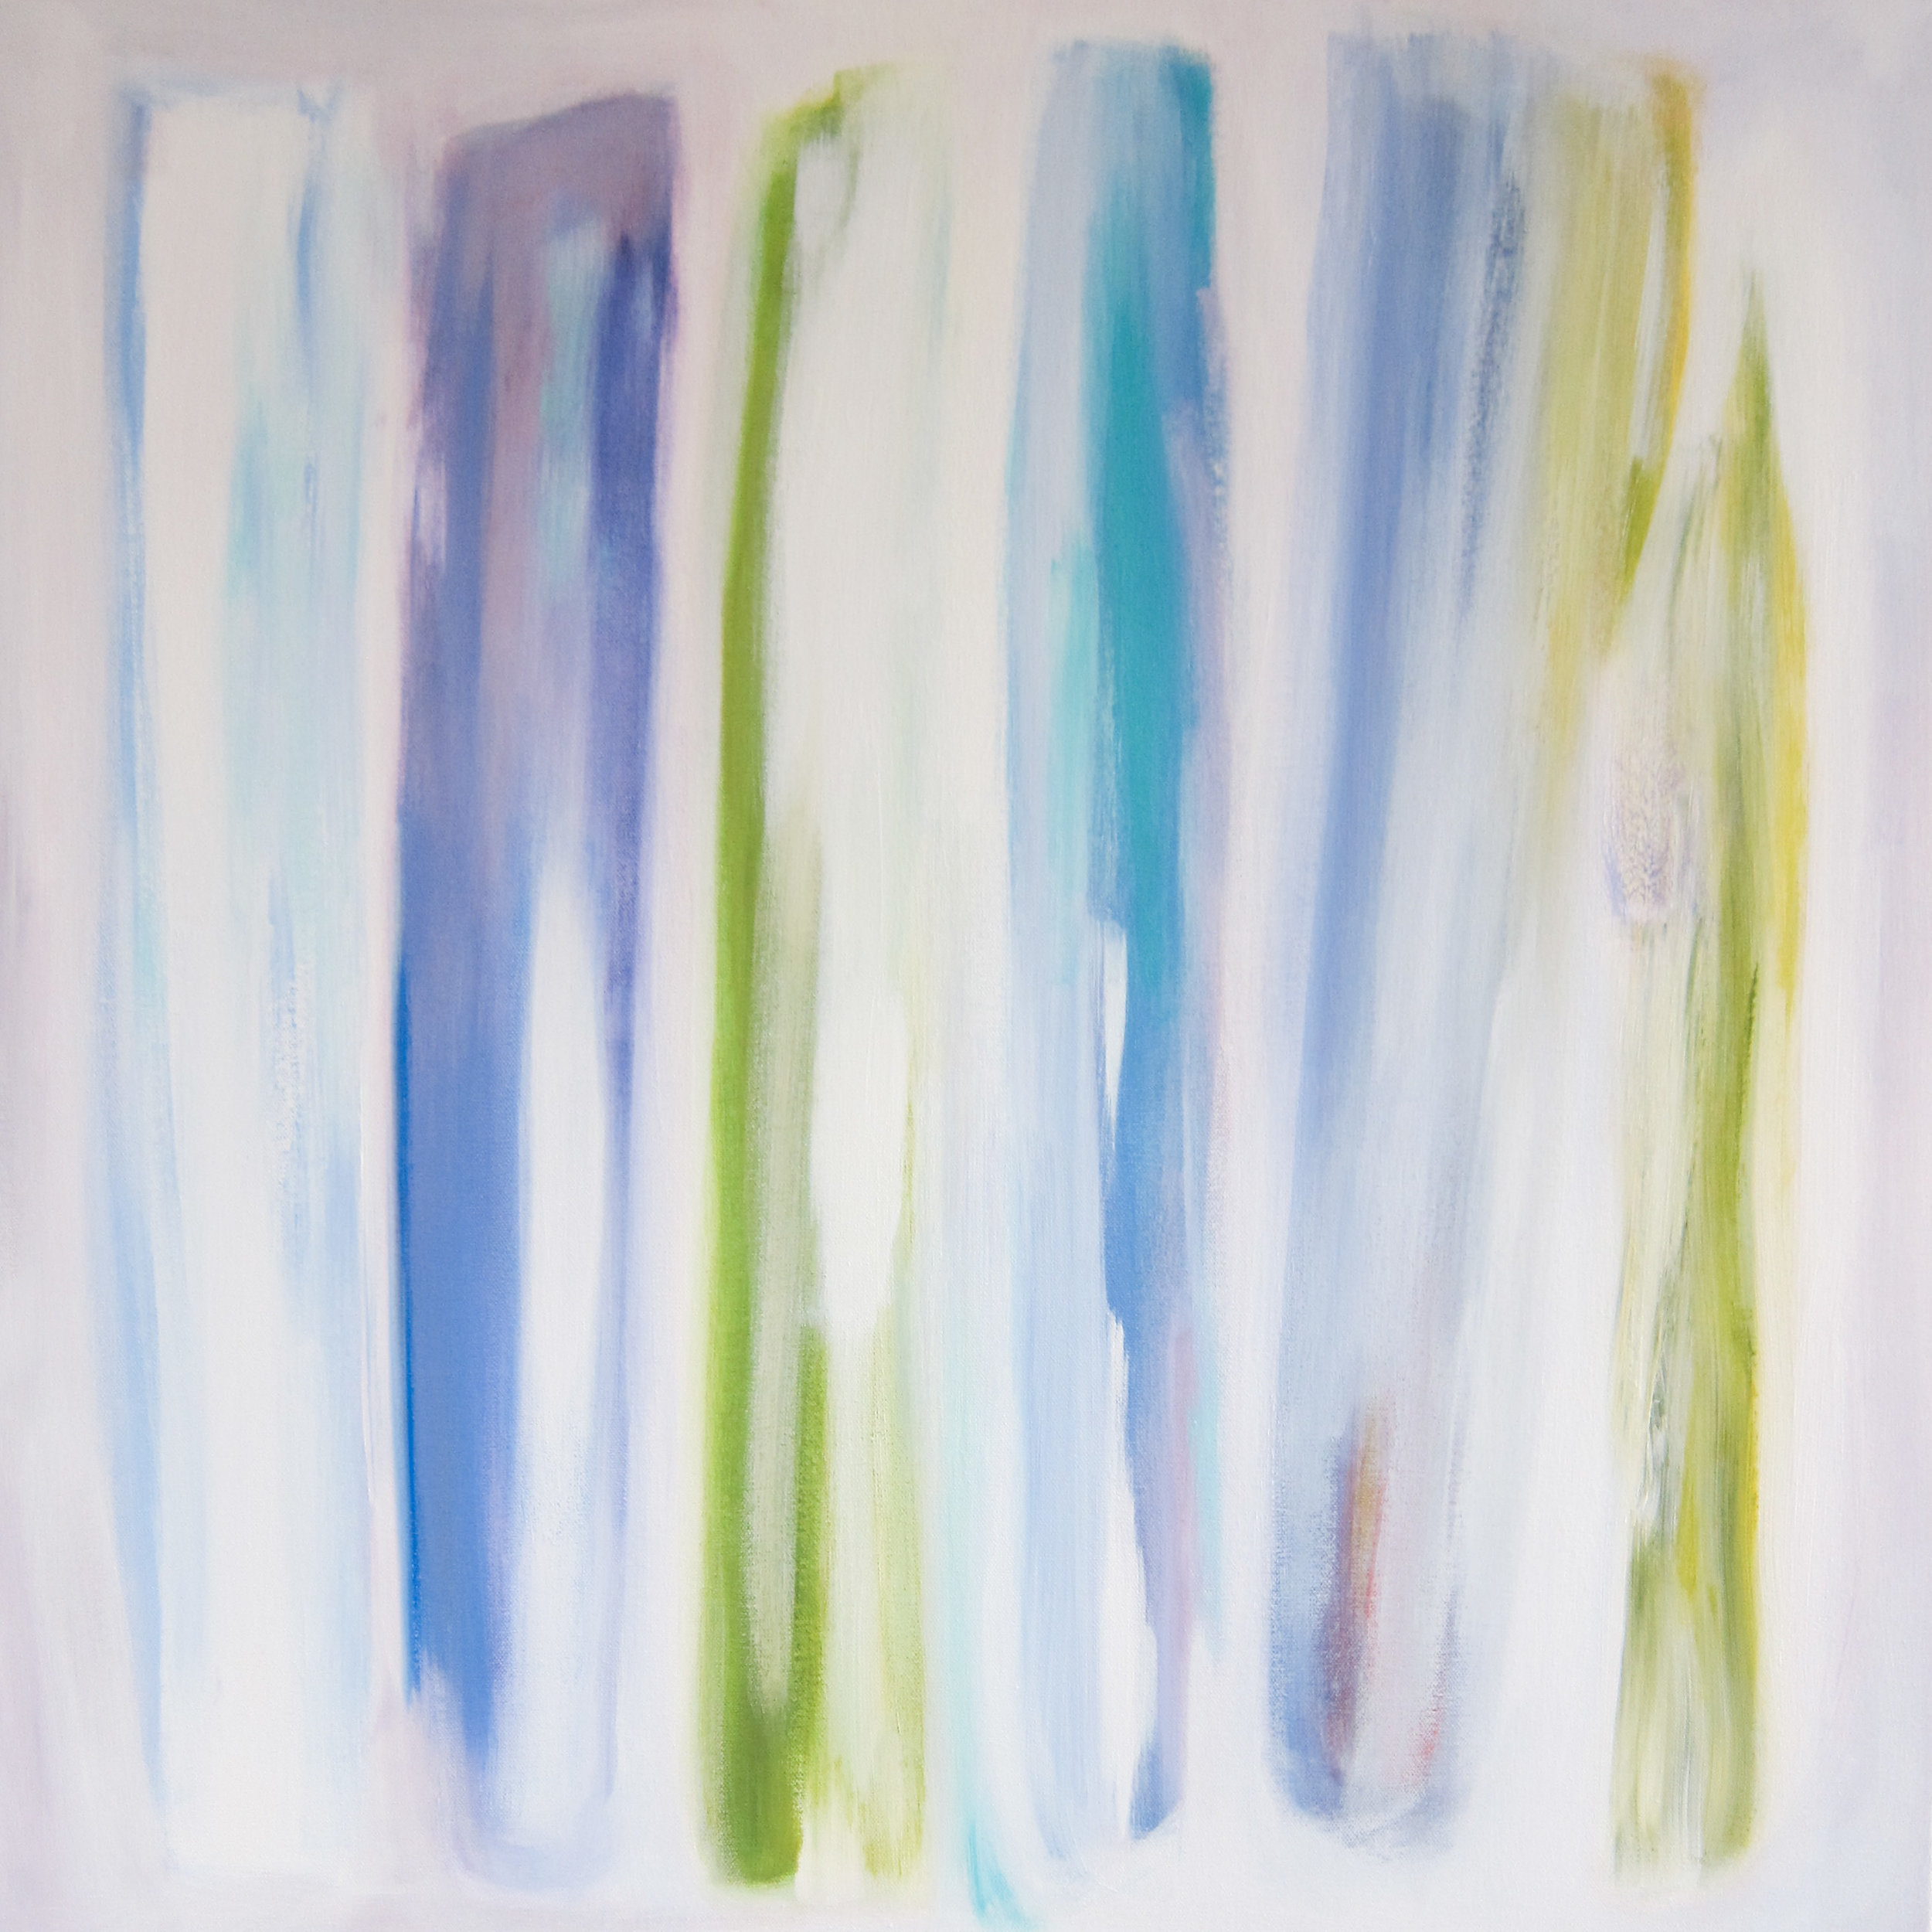 """Winter Glory"", acrylic, 30 x 30"", $1,200"